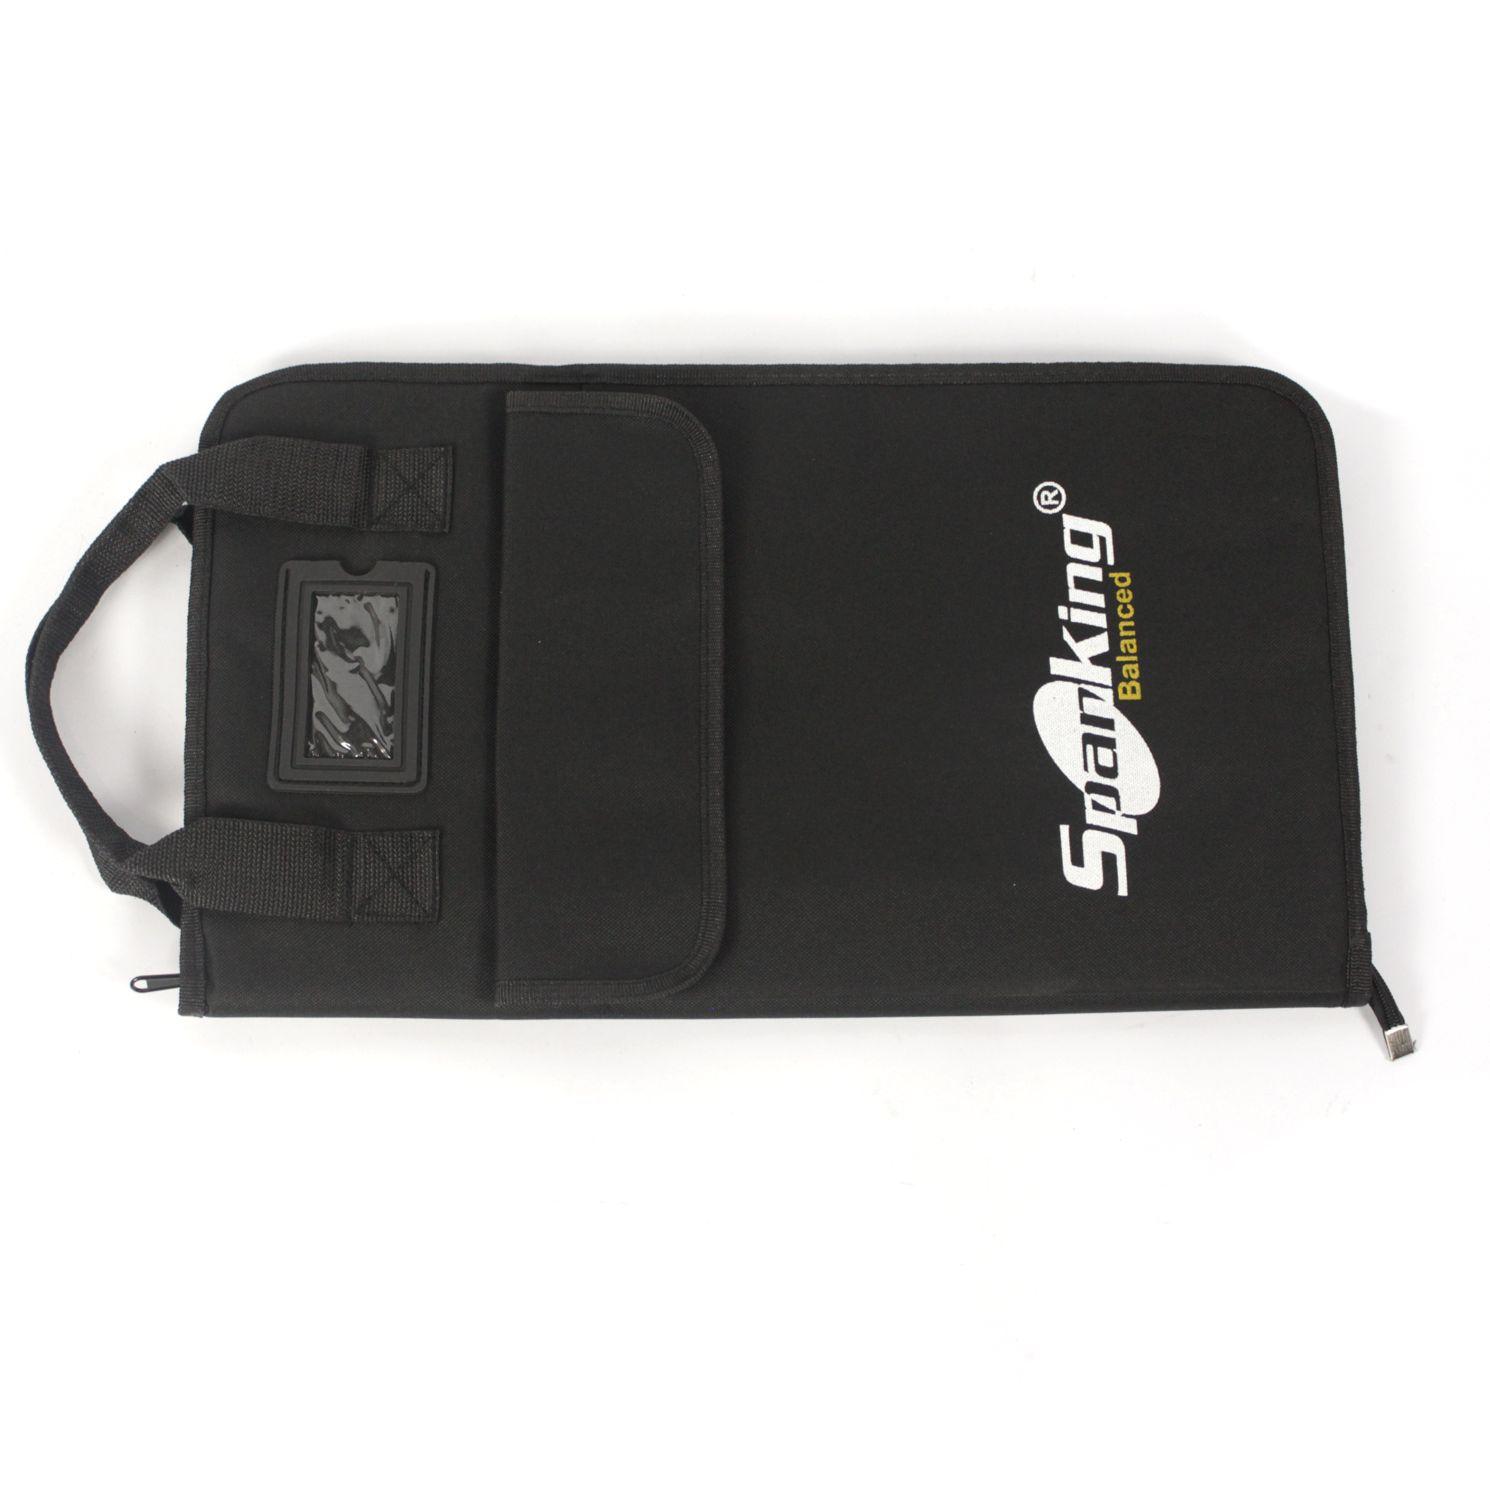 Capa para Baqueta de Bateria Spanking - Grande